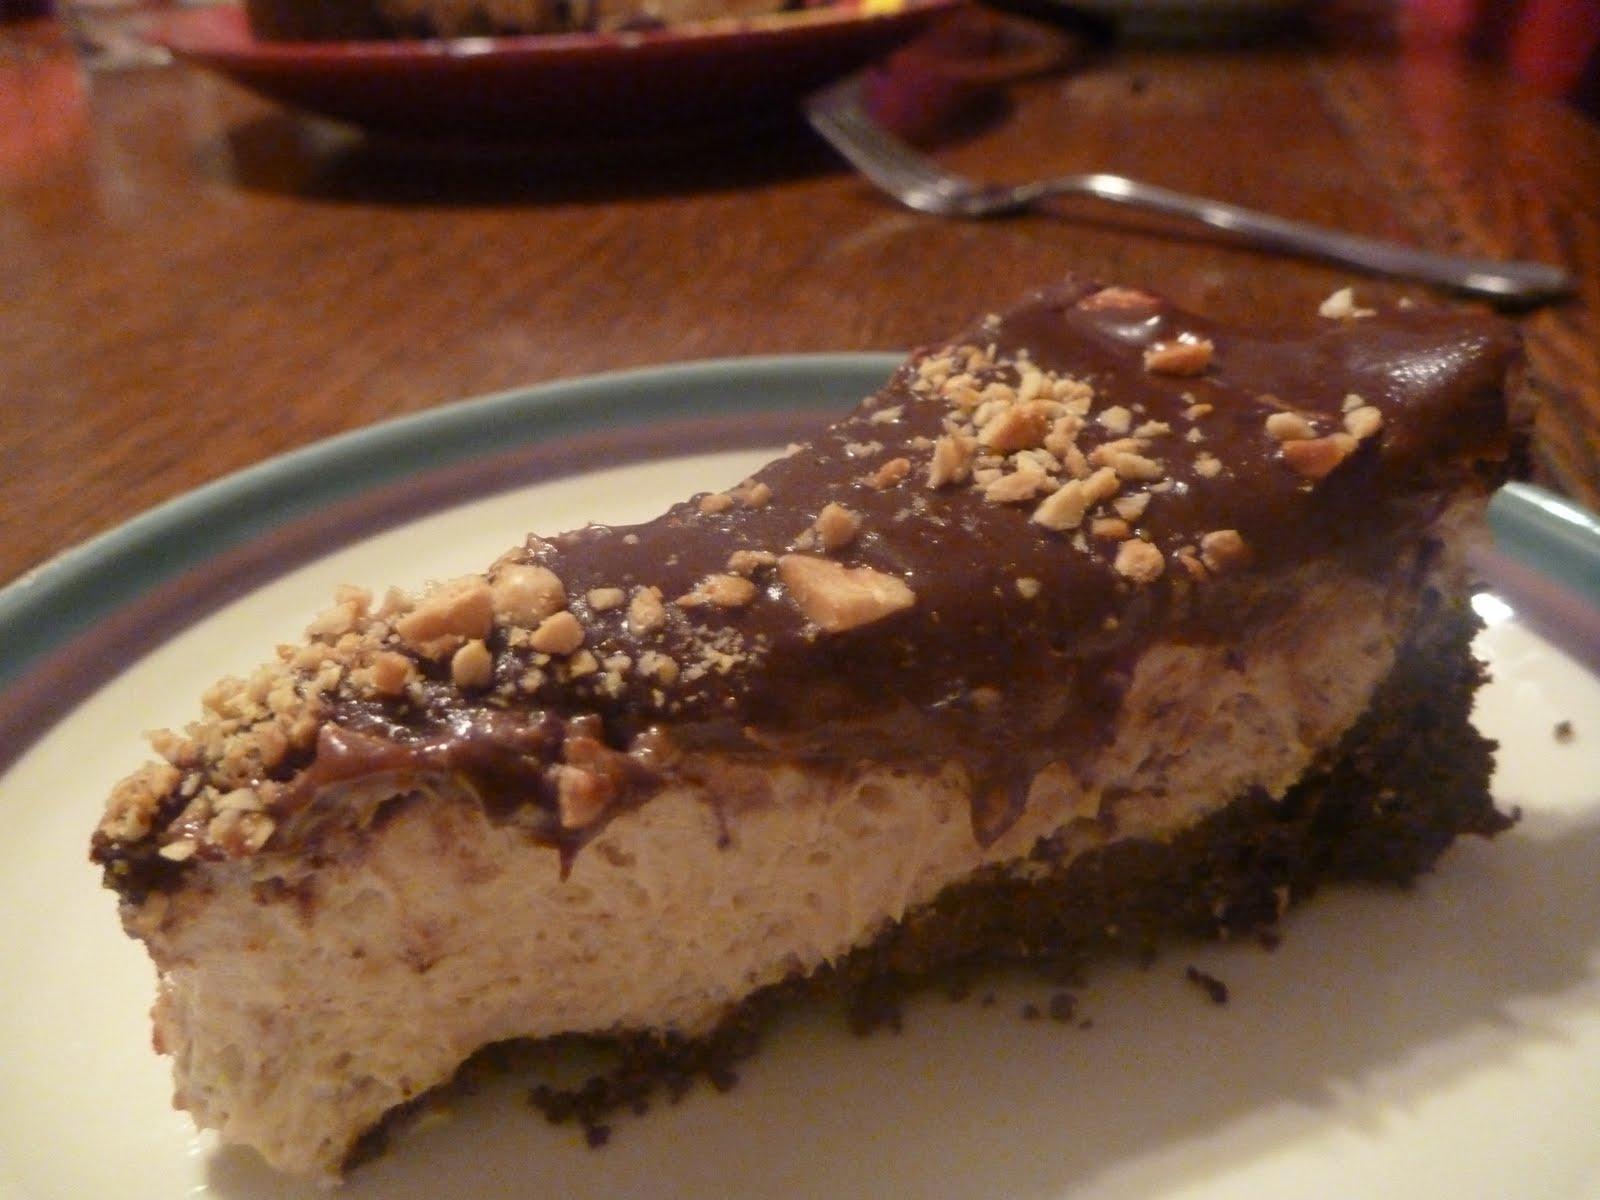 Double Chocolate Peanut Butter Pie